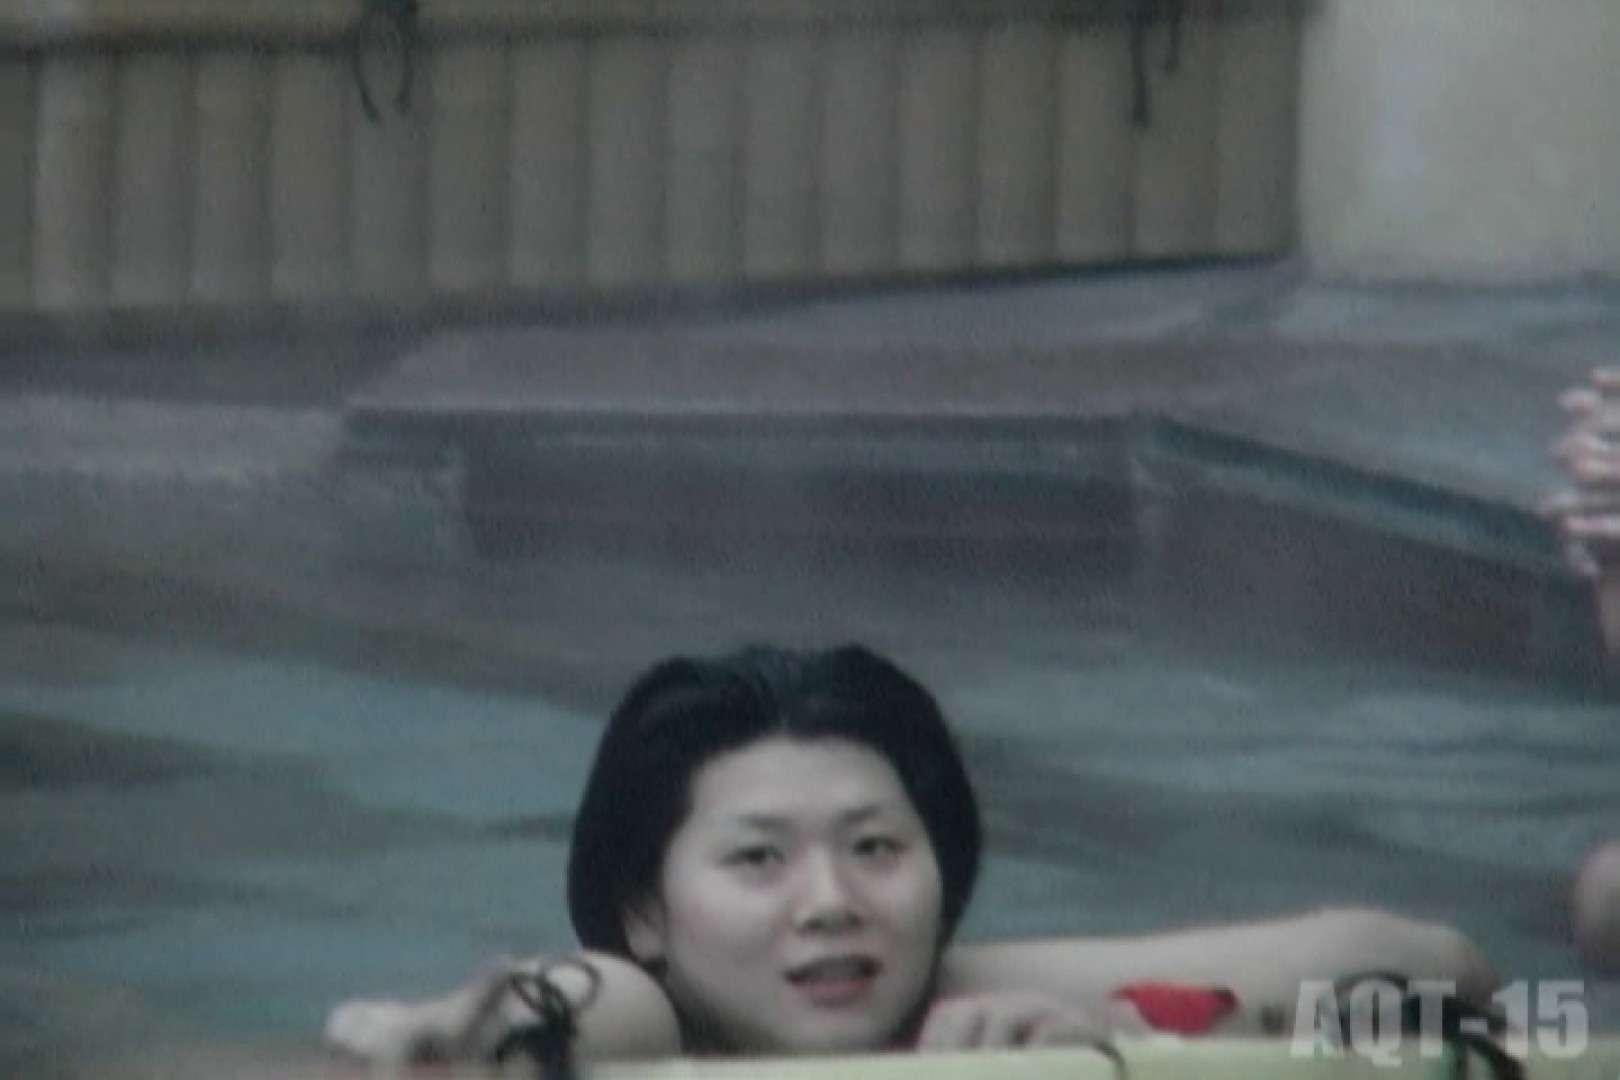 Aquaな露天風呂Vol.837 盗撮映像  107Pix 67